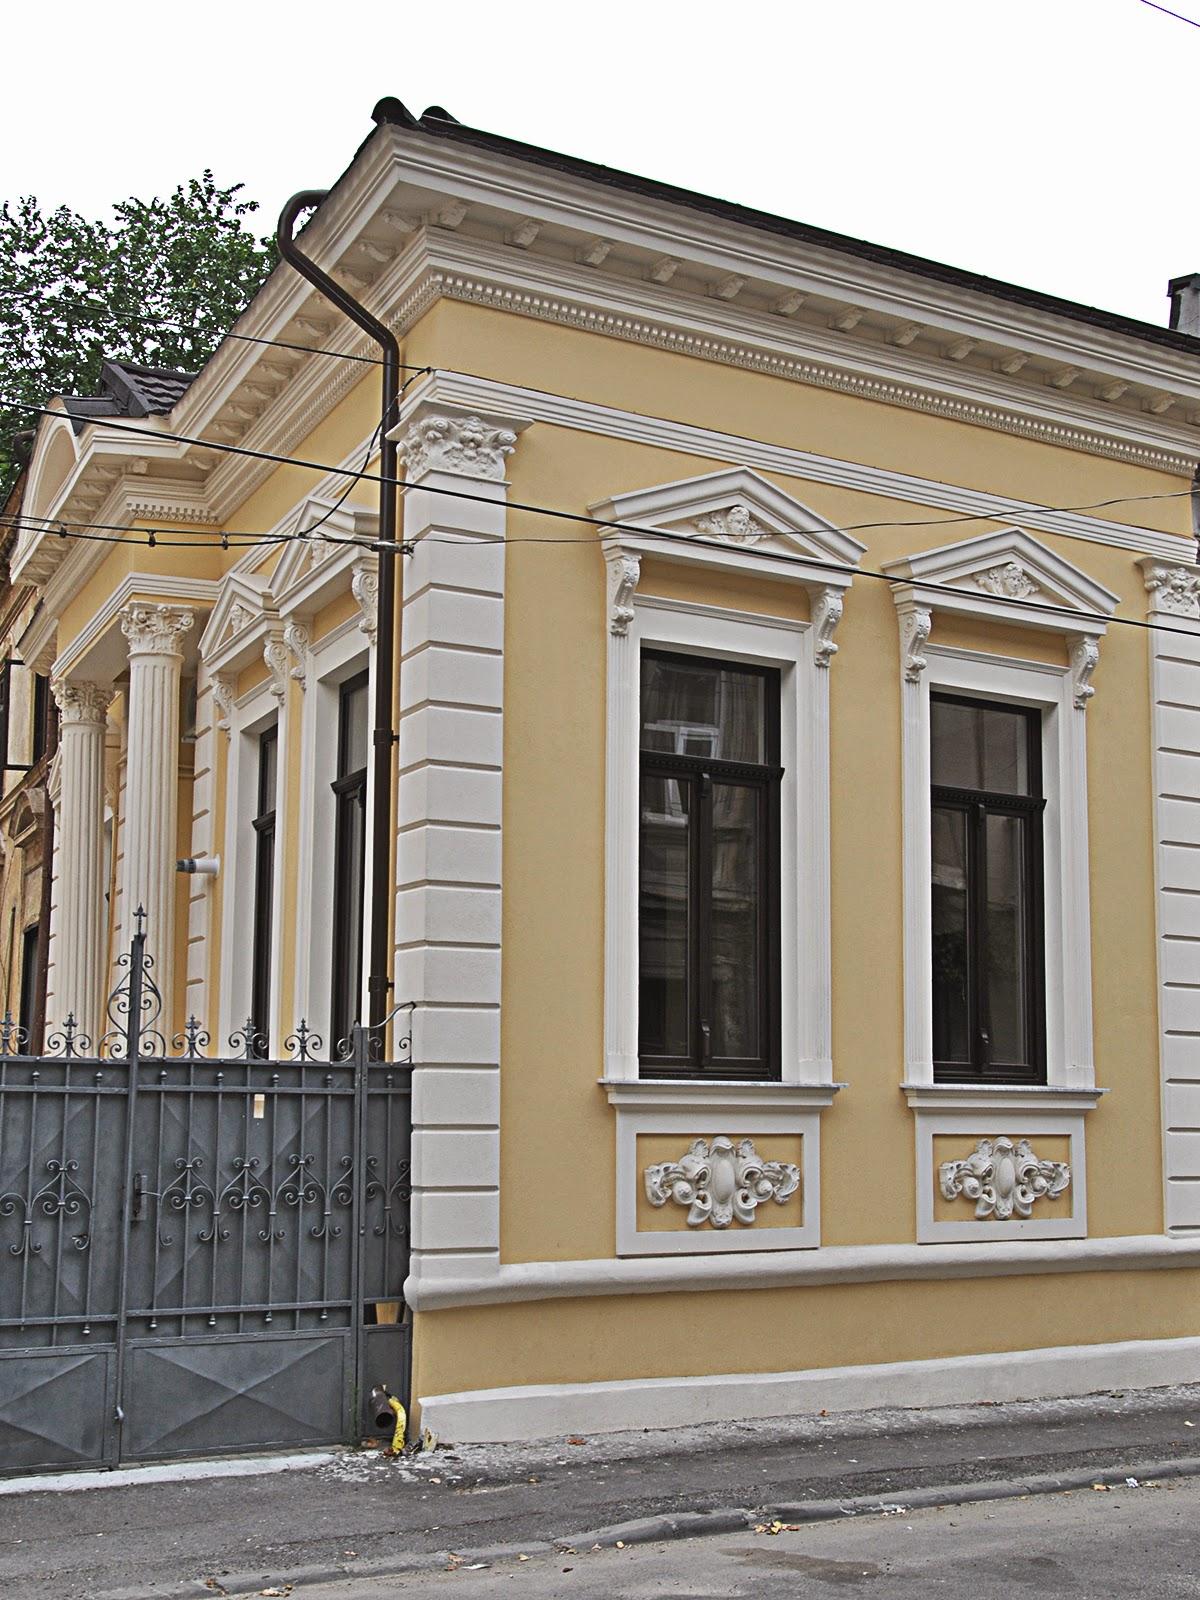 Case Vechi Restaurate cu profile polistiren, case cu fronton